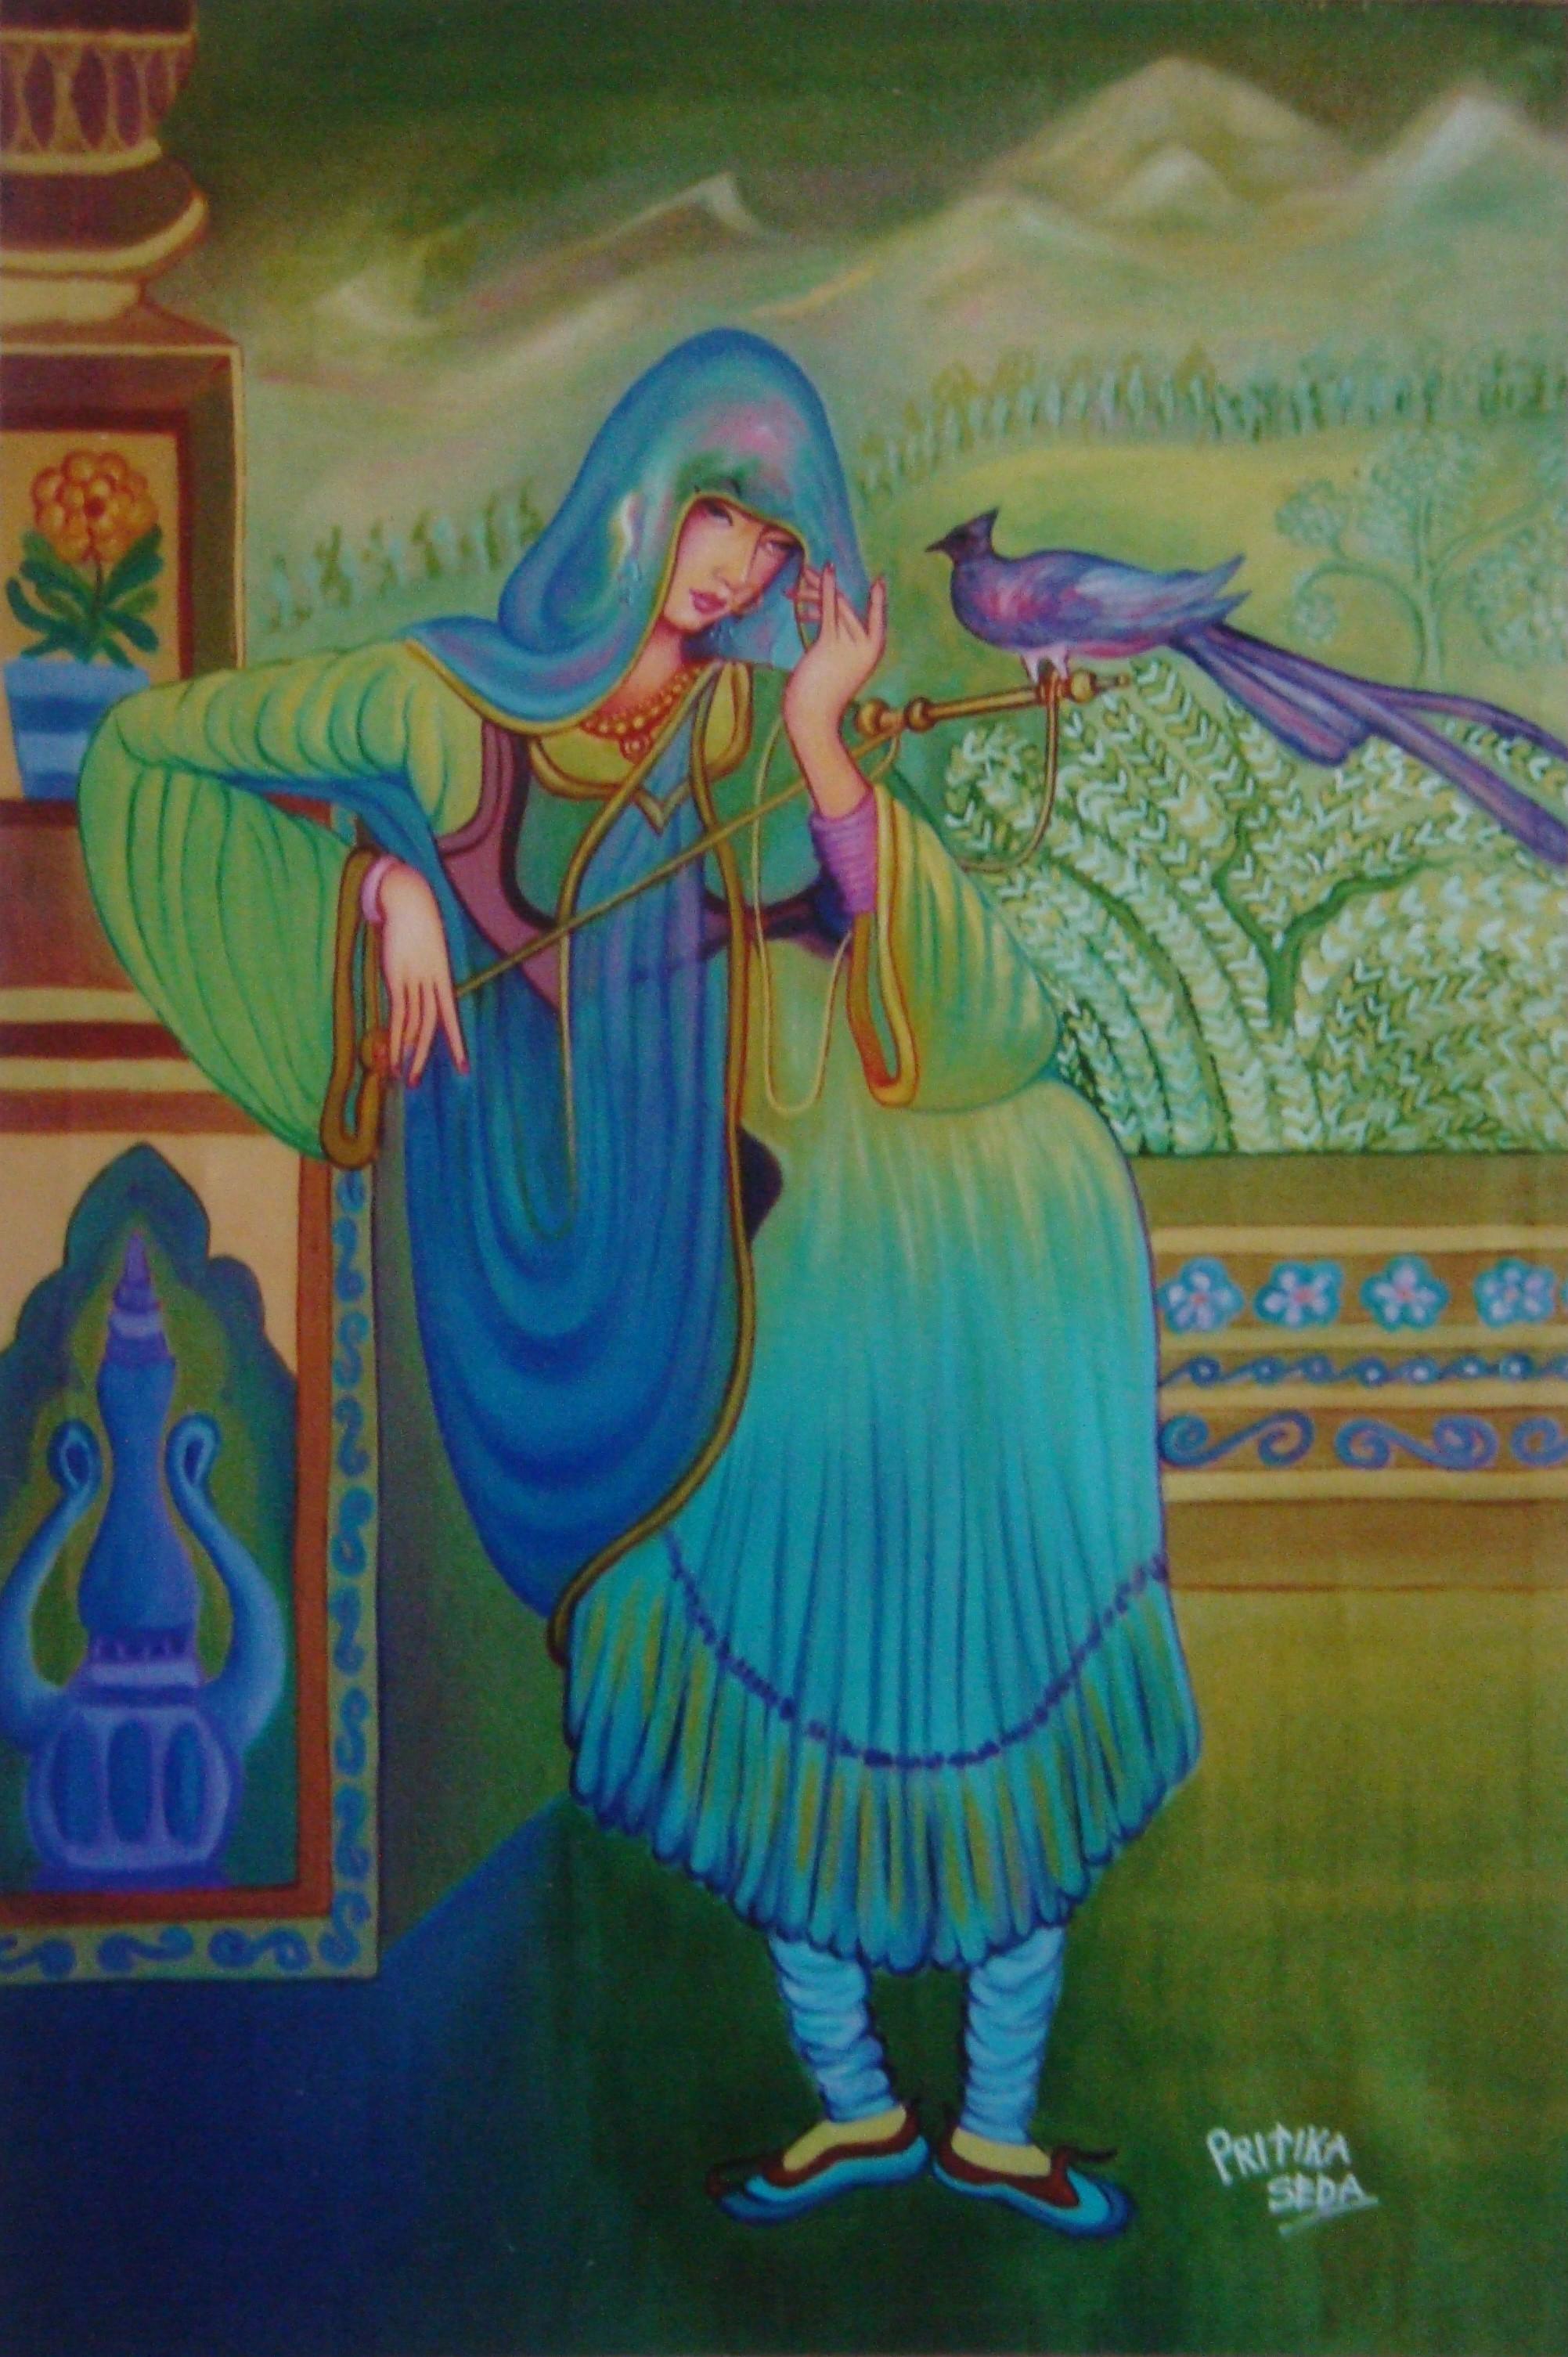 BEAUTIFUL LADY WITH PEACOCK by PRITIKA SEDA